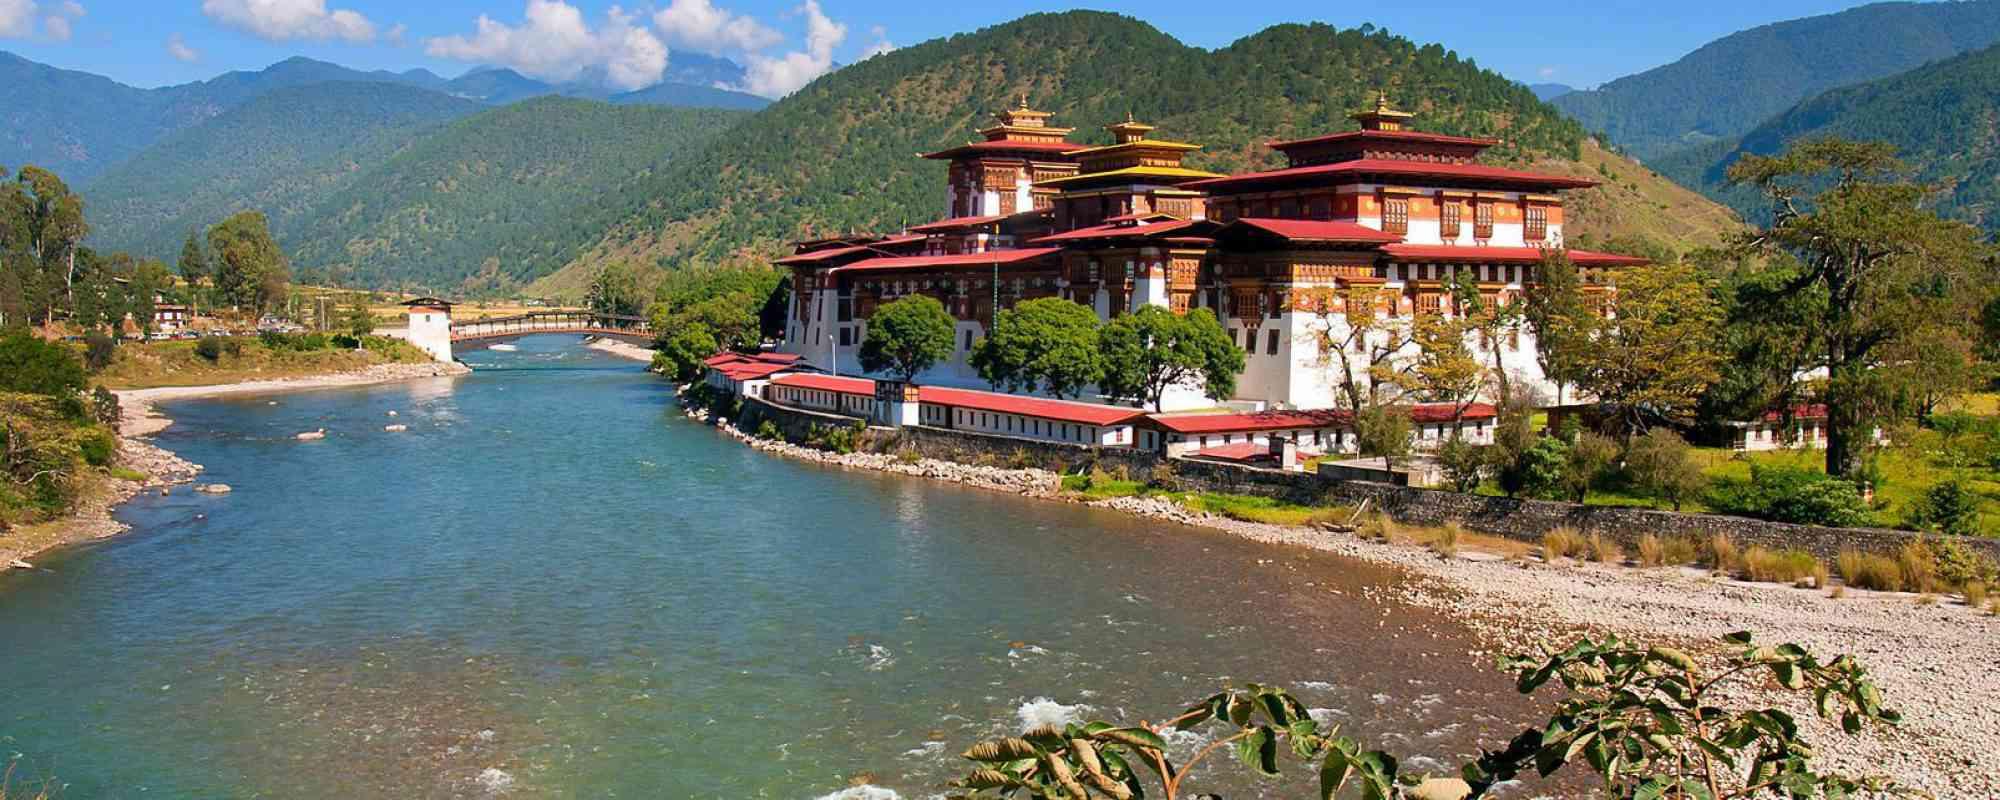 le royaume du bhoutan